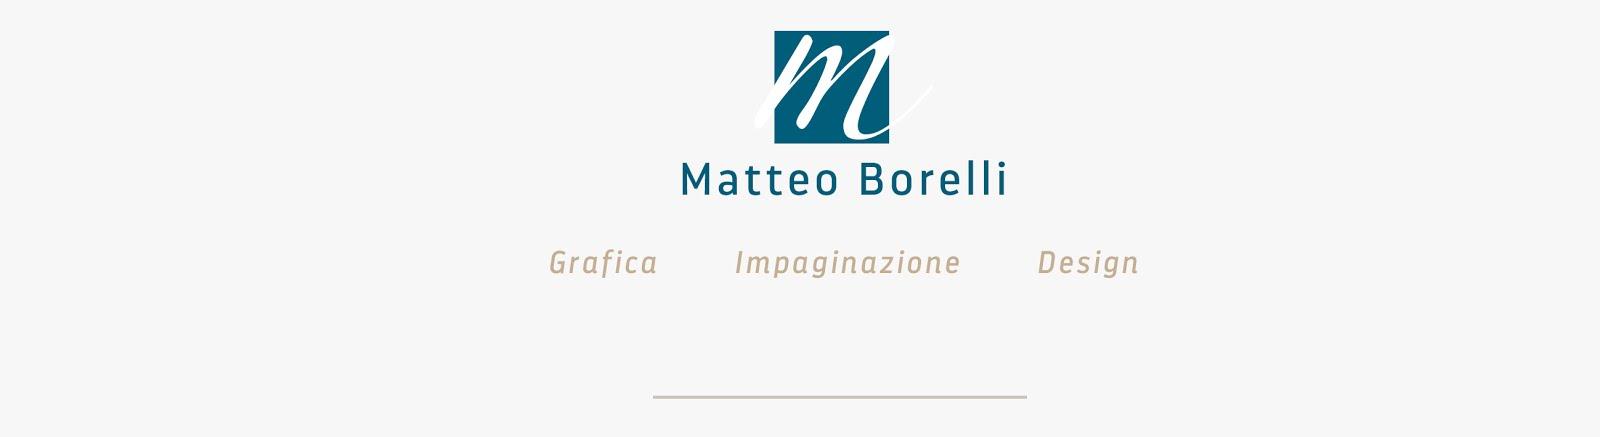 Matteo Borelli